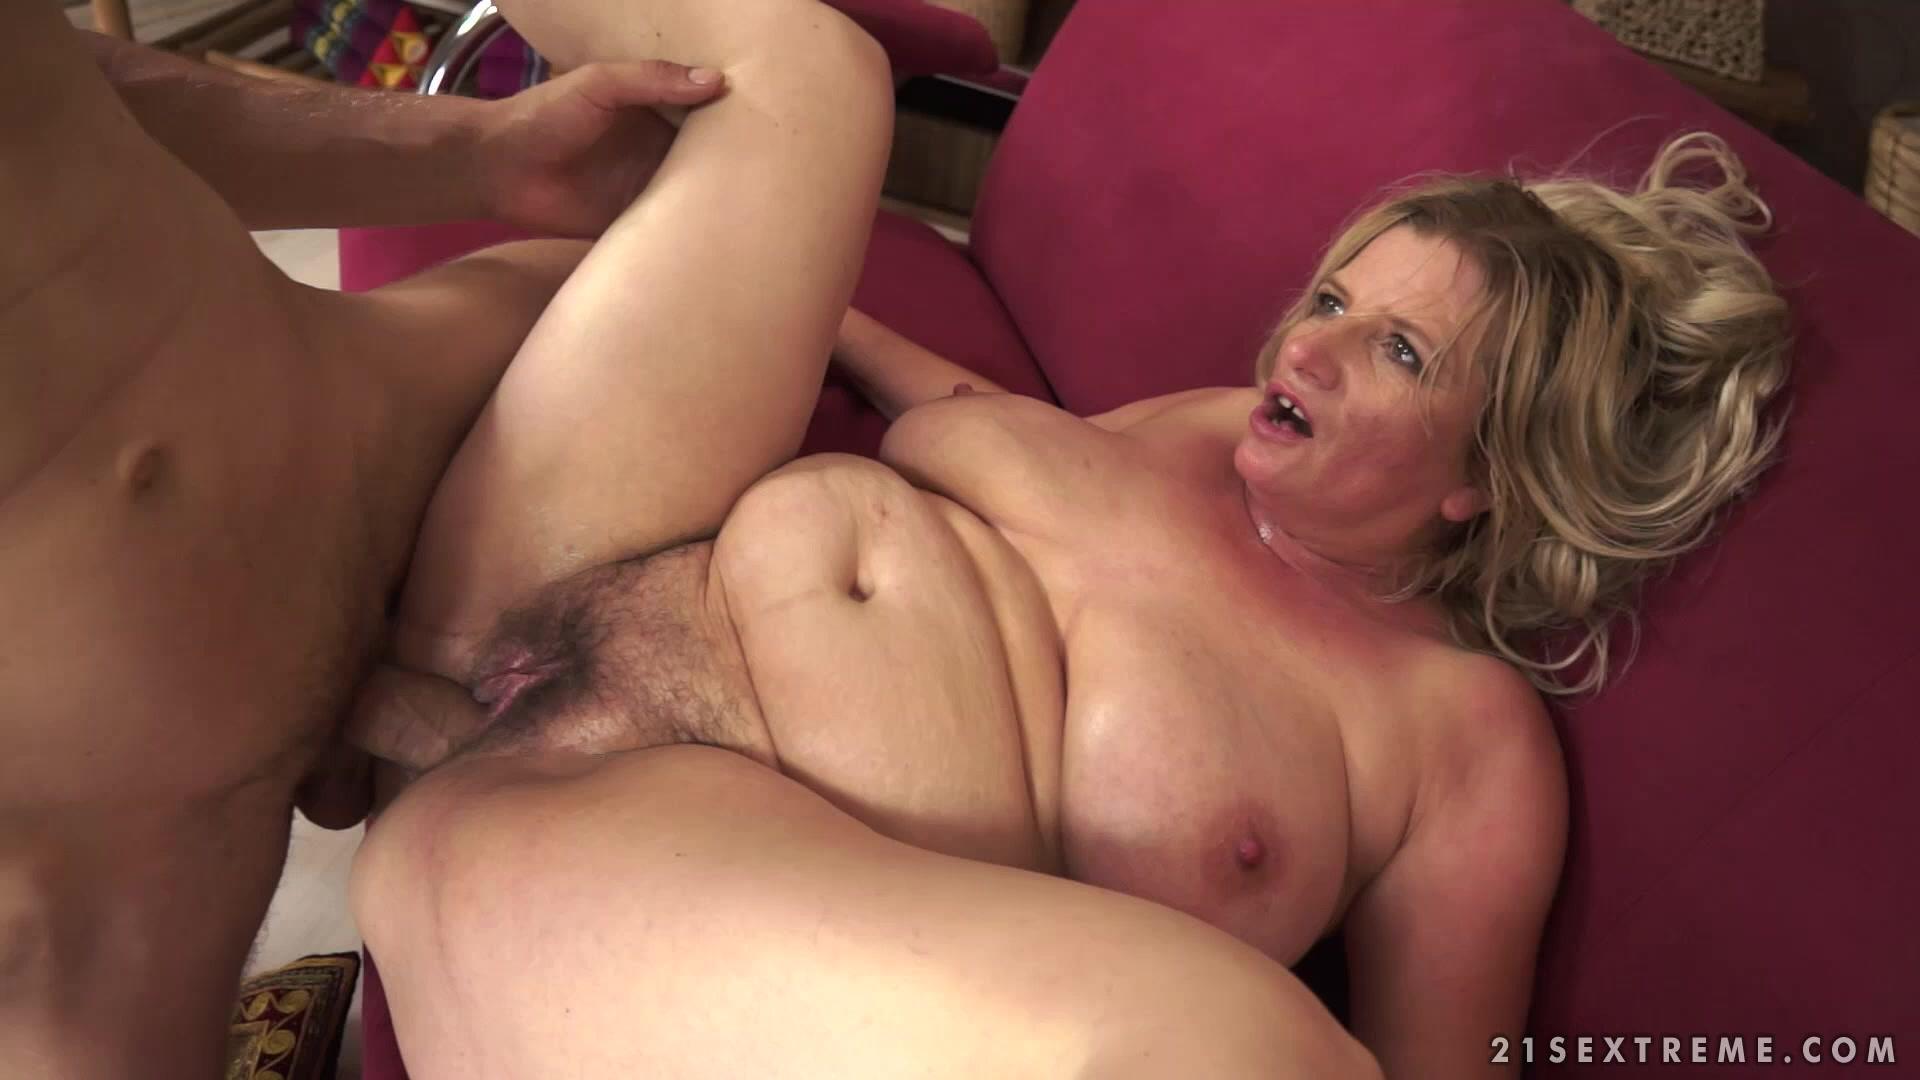 porno-v-hd-s-krasivimi-zrelimi-tetkami